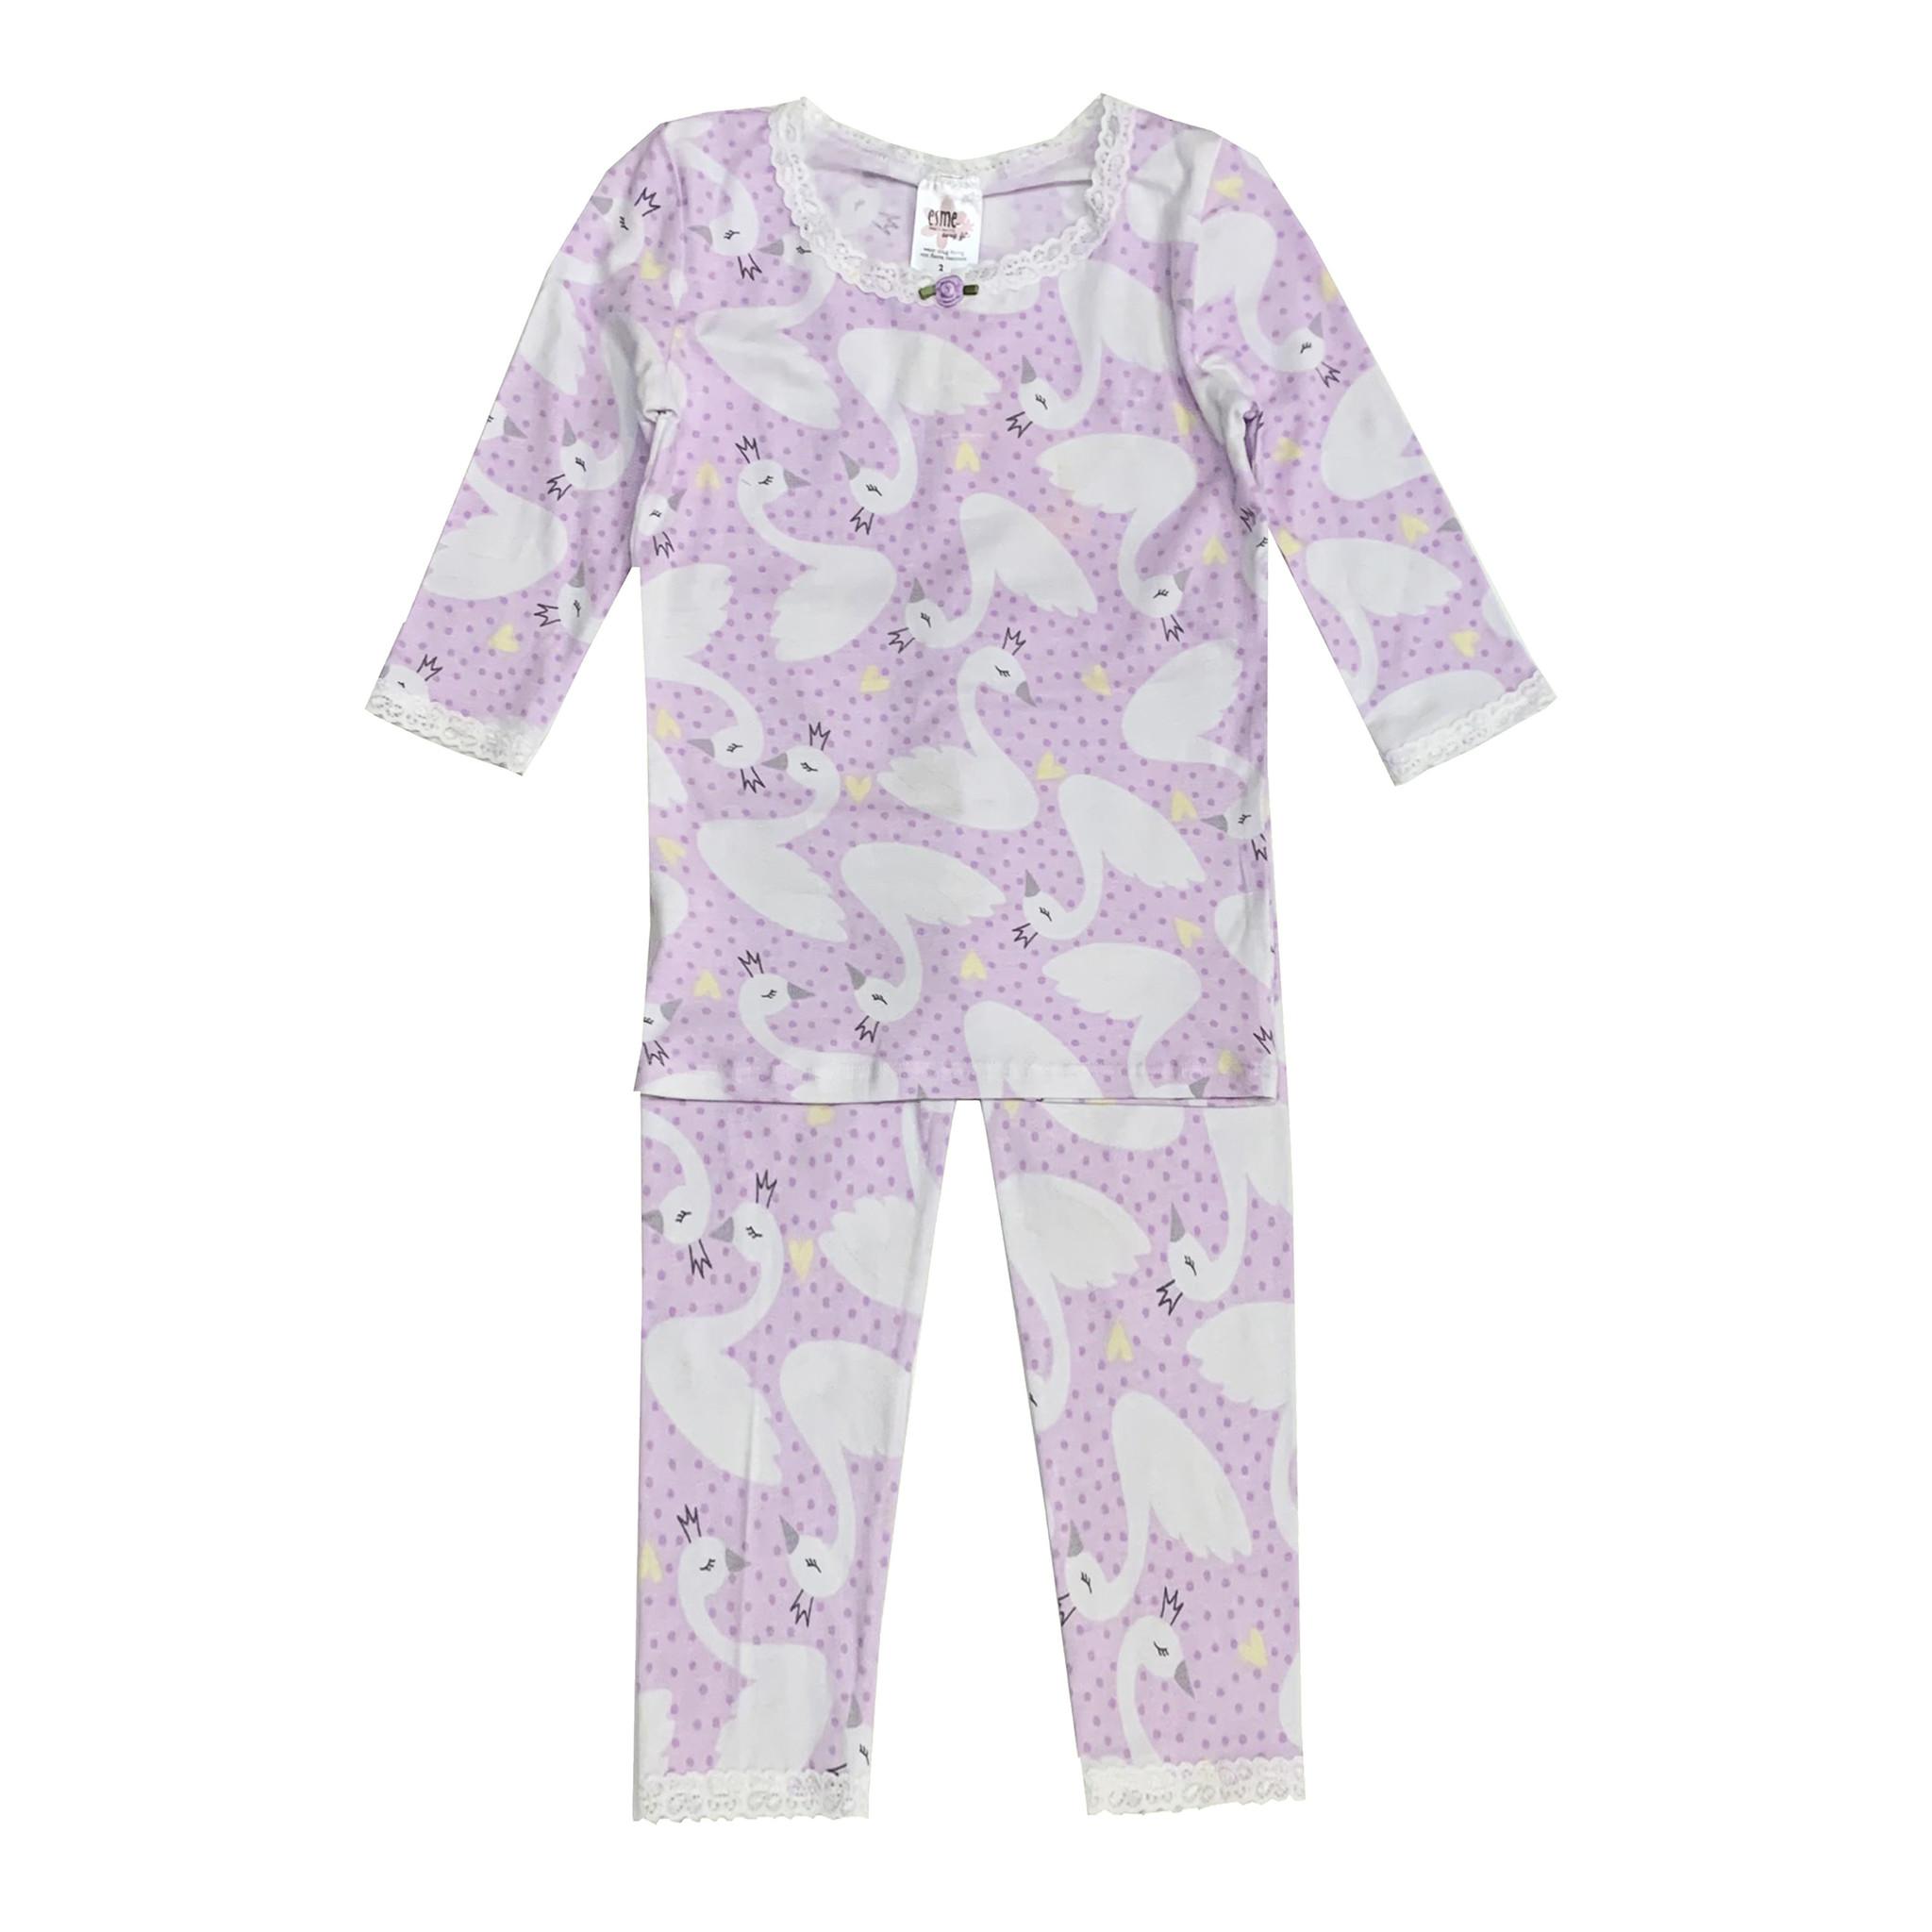 Esme Lavender Swans Infant Pajama Set